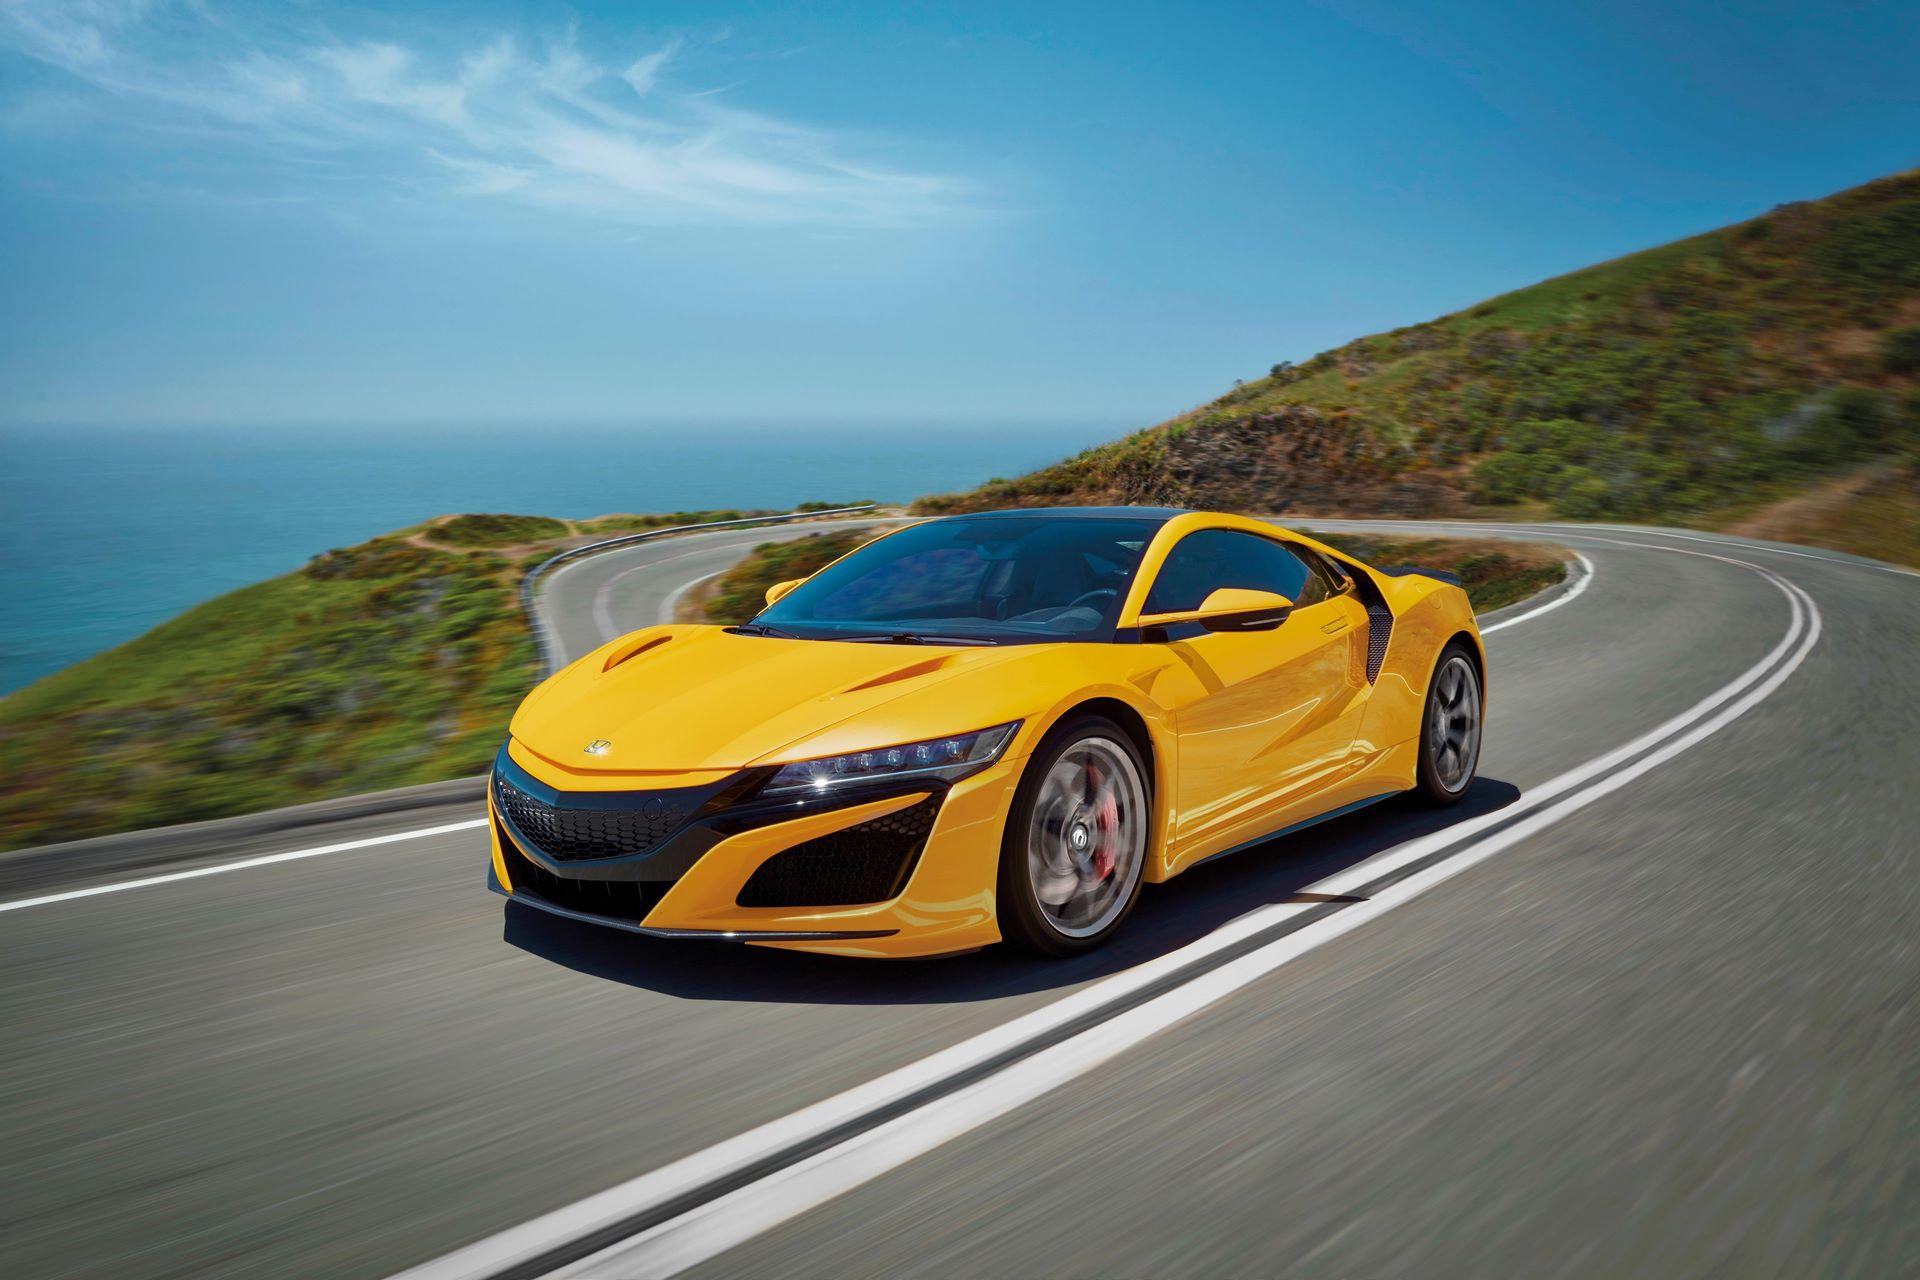 Honda-NSX-Indy-Yellow-Pearl-II-1